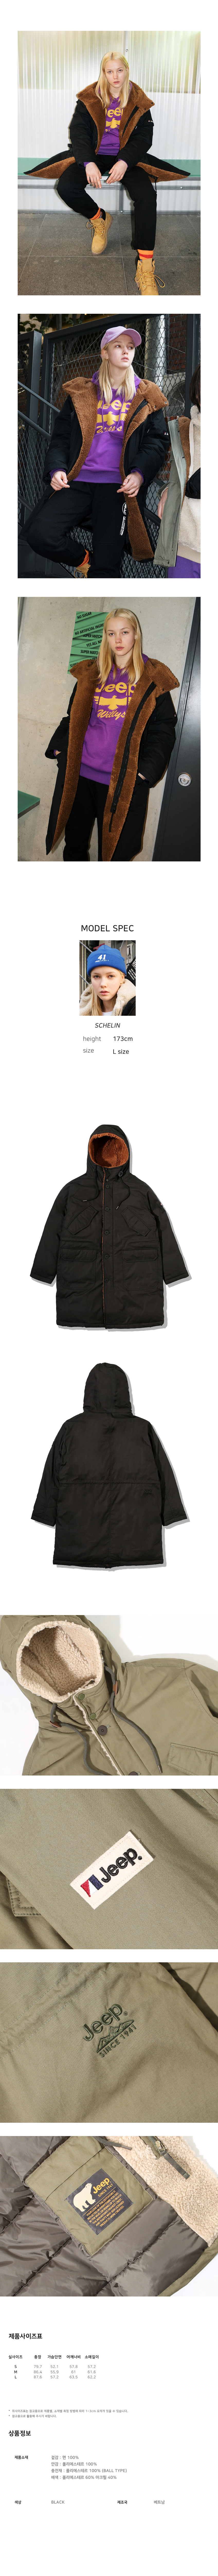 Hood Fleece Vintage Jacket (GK4JPU407BK)